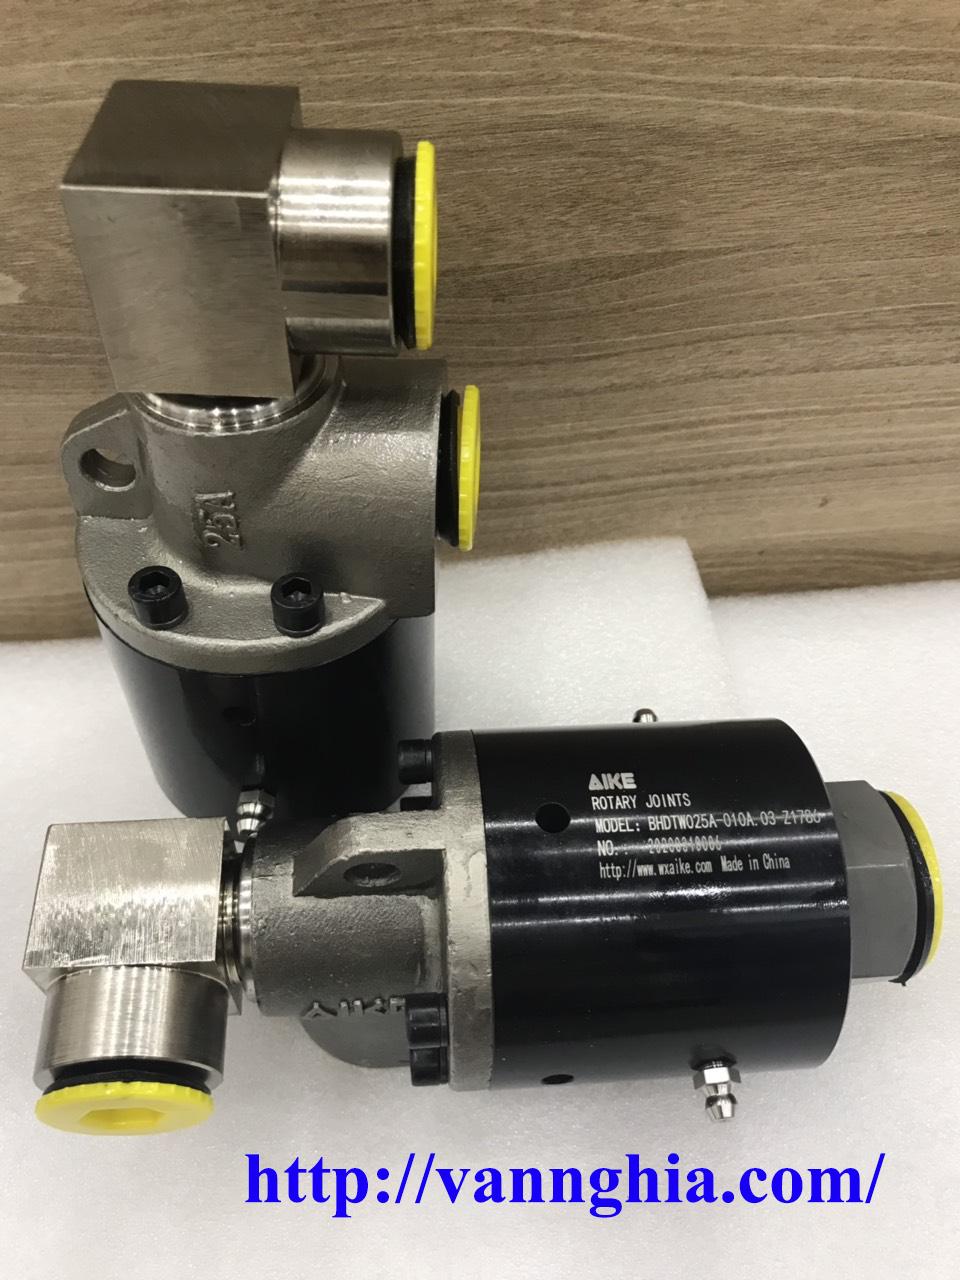 Khớp nối xoay BHDTW025A - 010A.03.N727